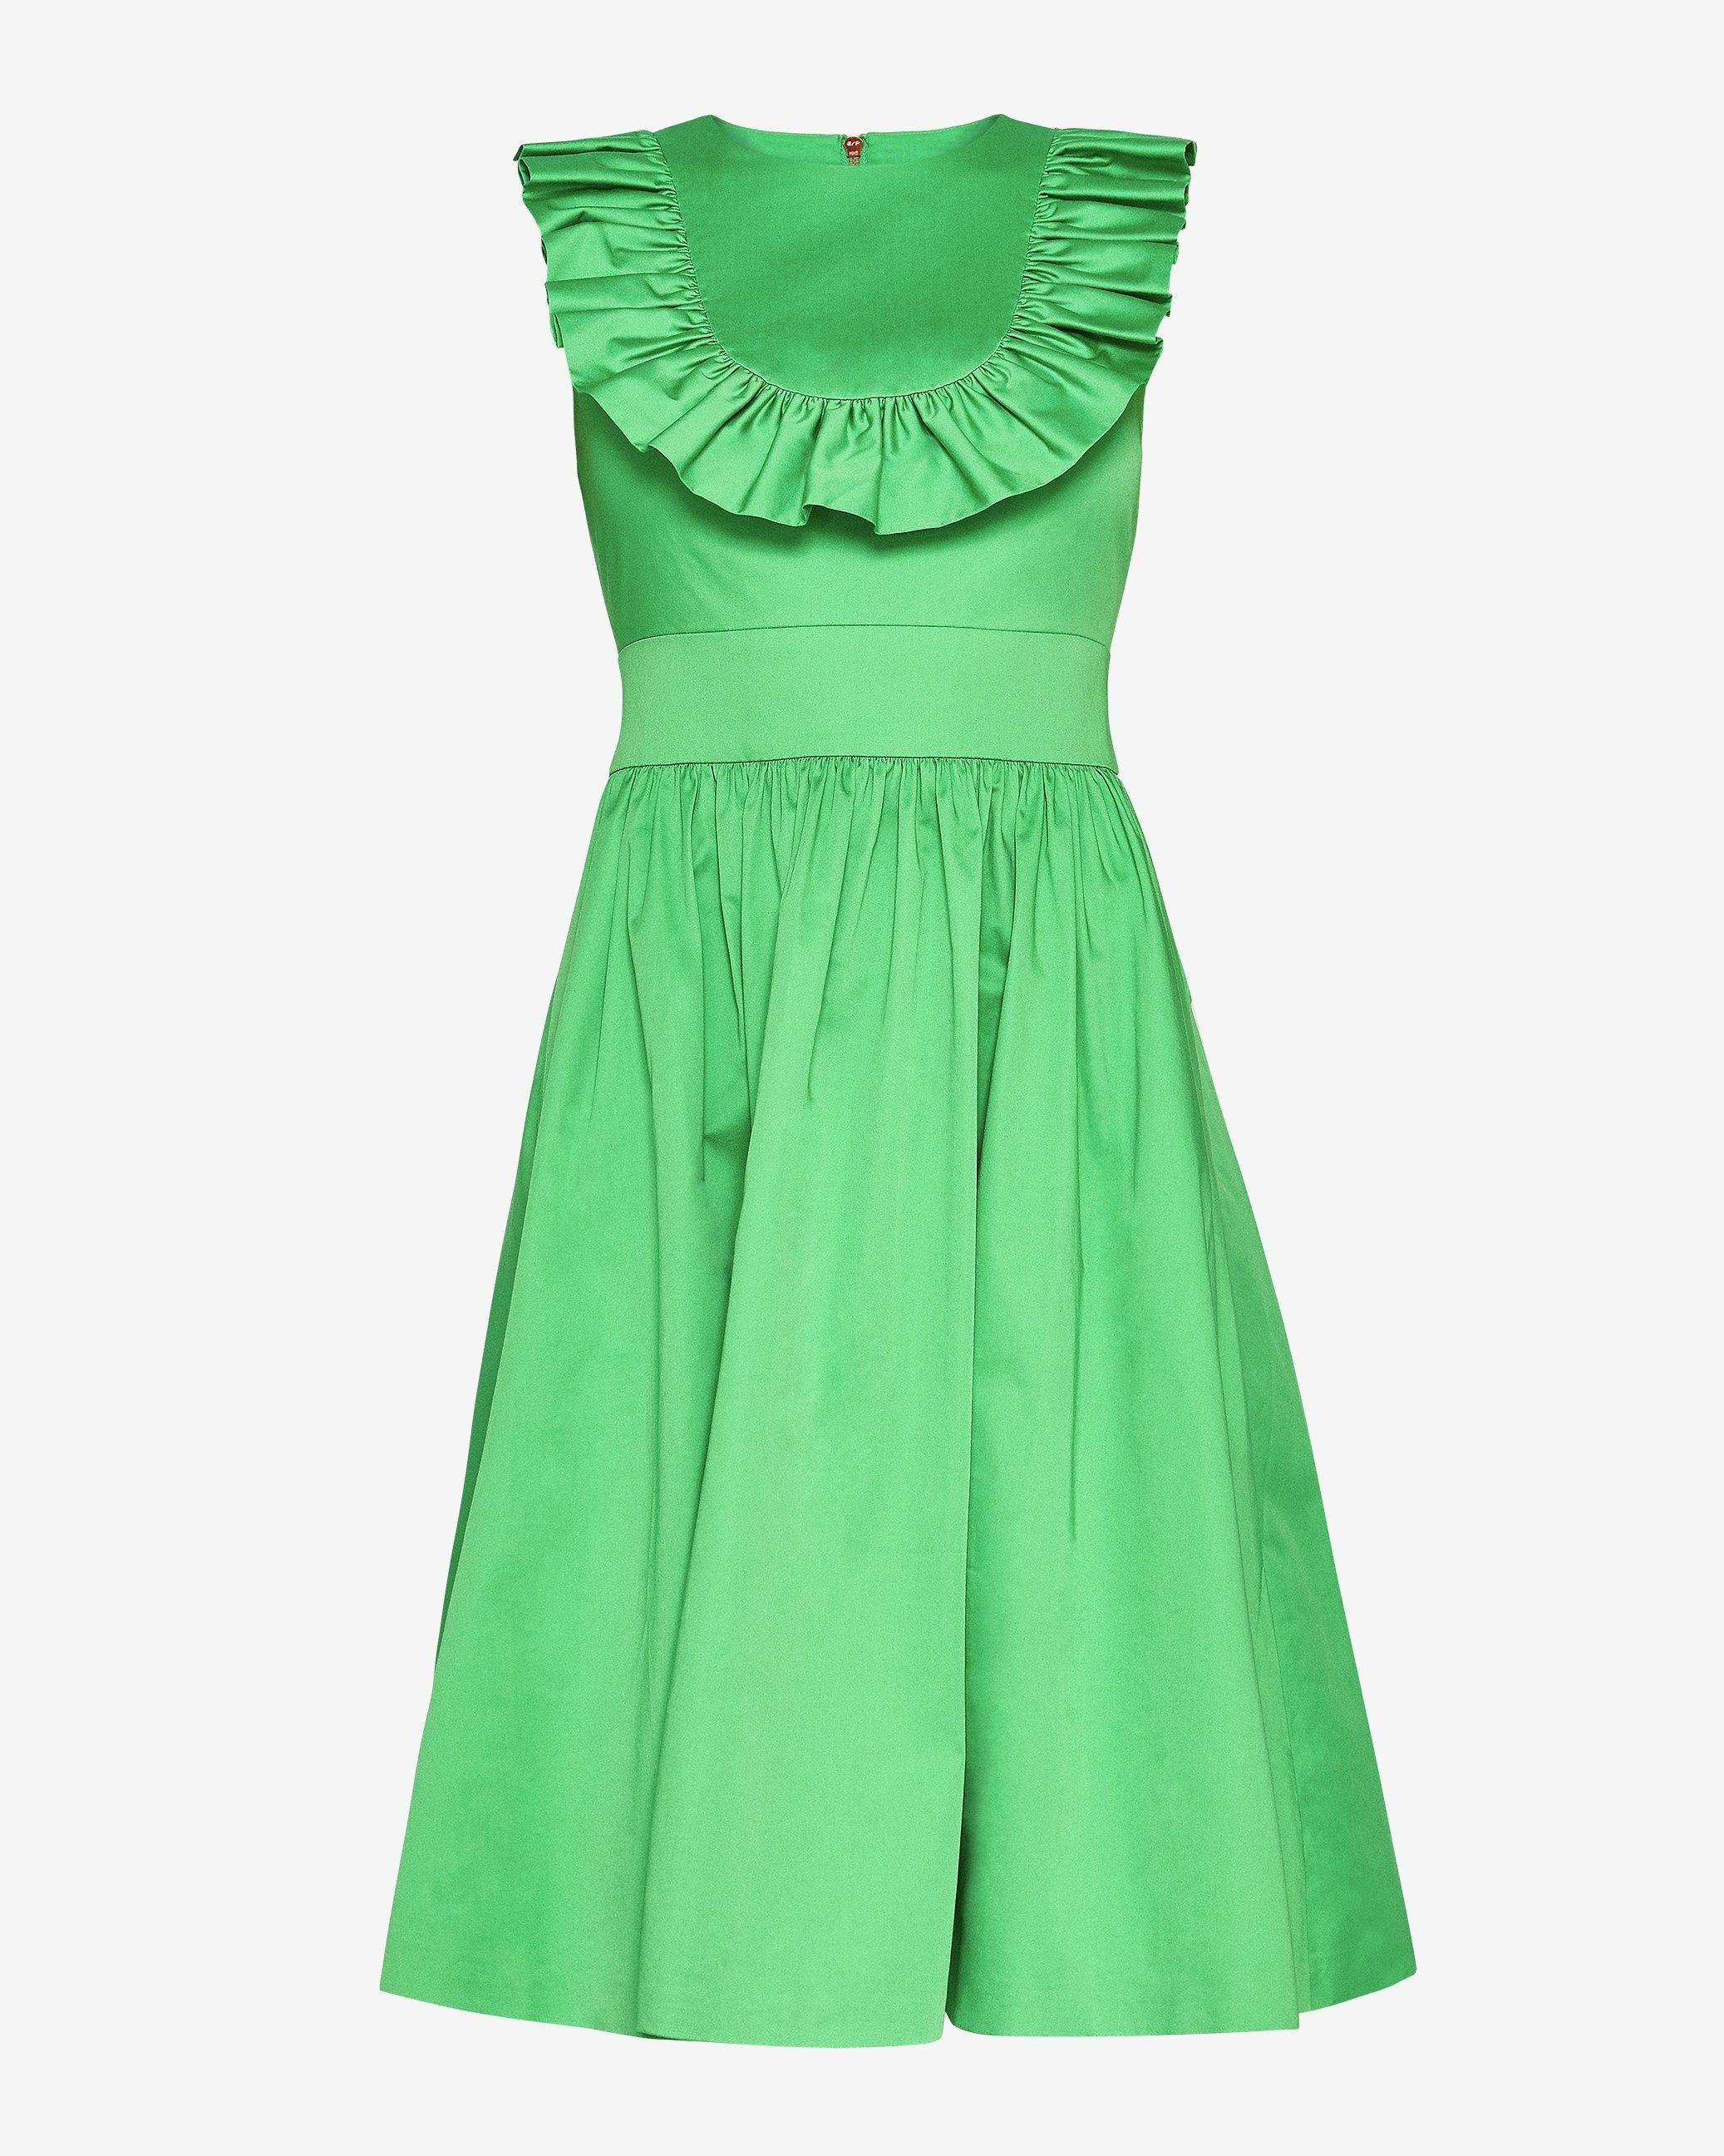 Ted Baker Awrah A-Line Ruffle Bib Midi Dress, Bright Green